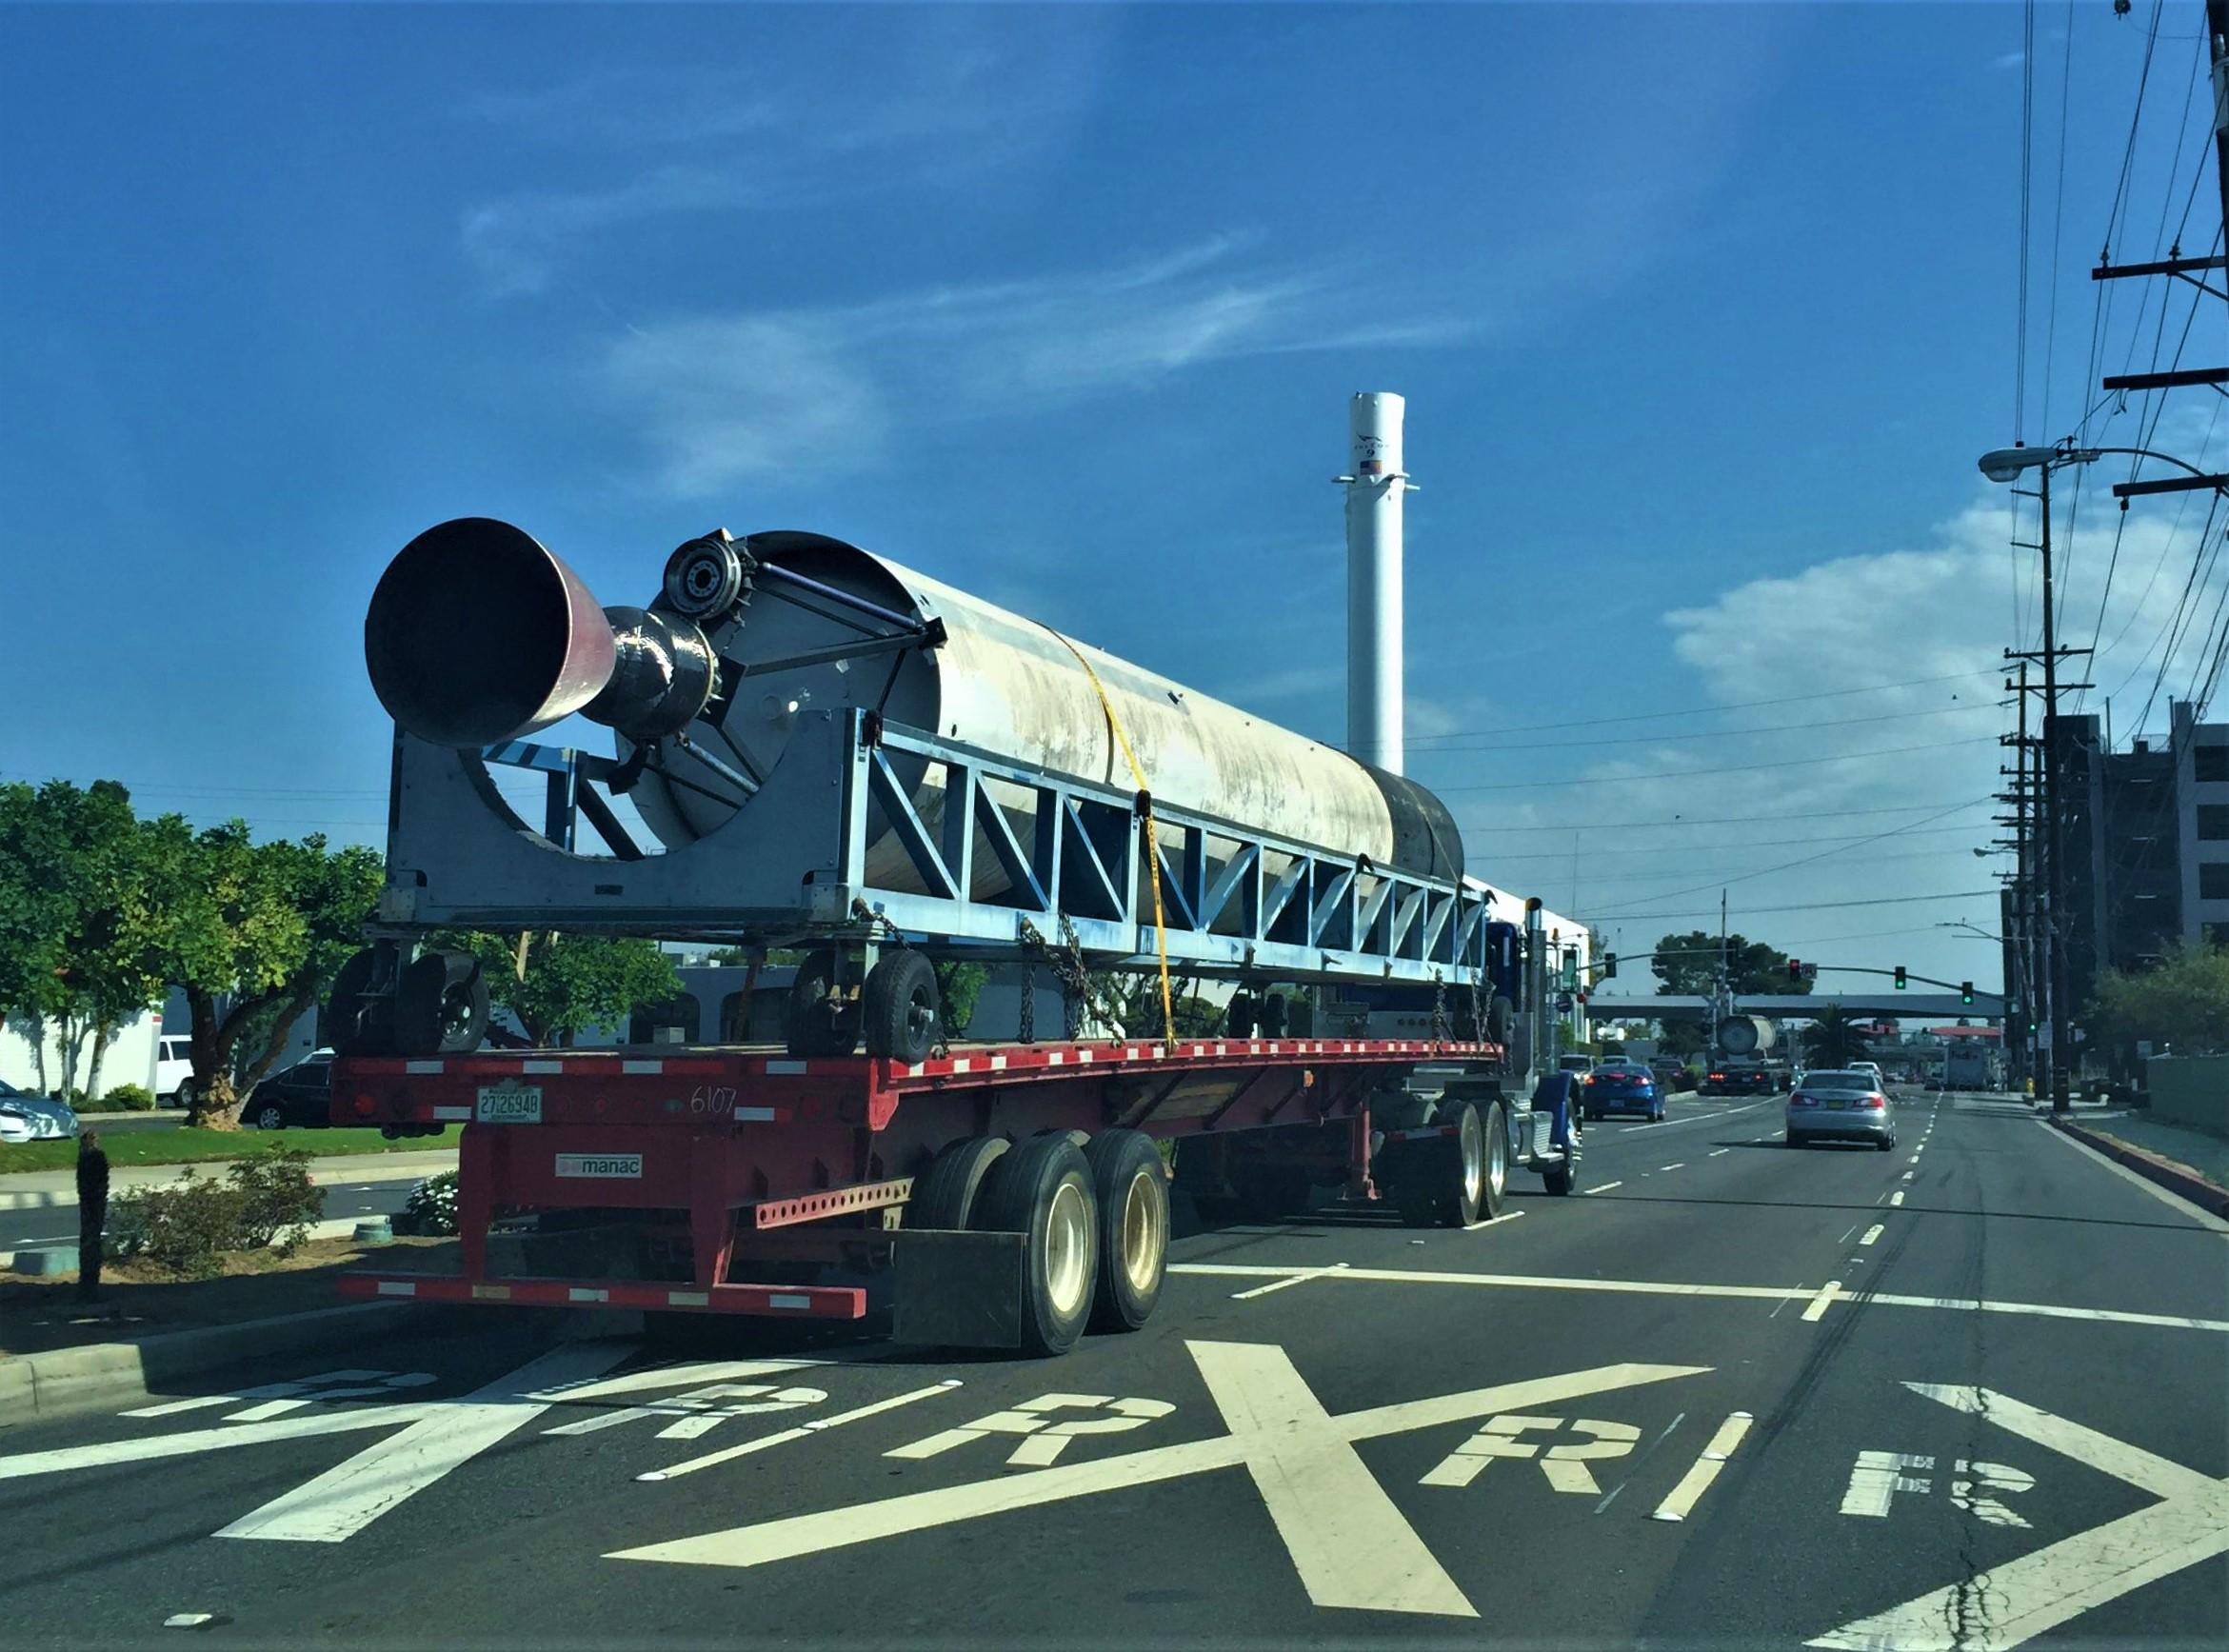 Falcon 1 transport Hawthorne 071118 (MarsOrBust101)